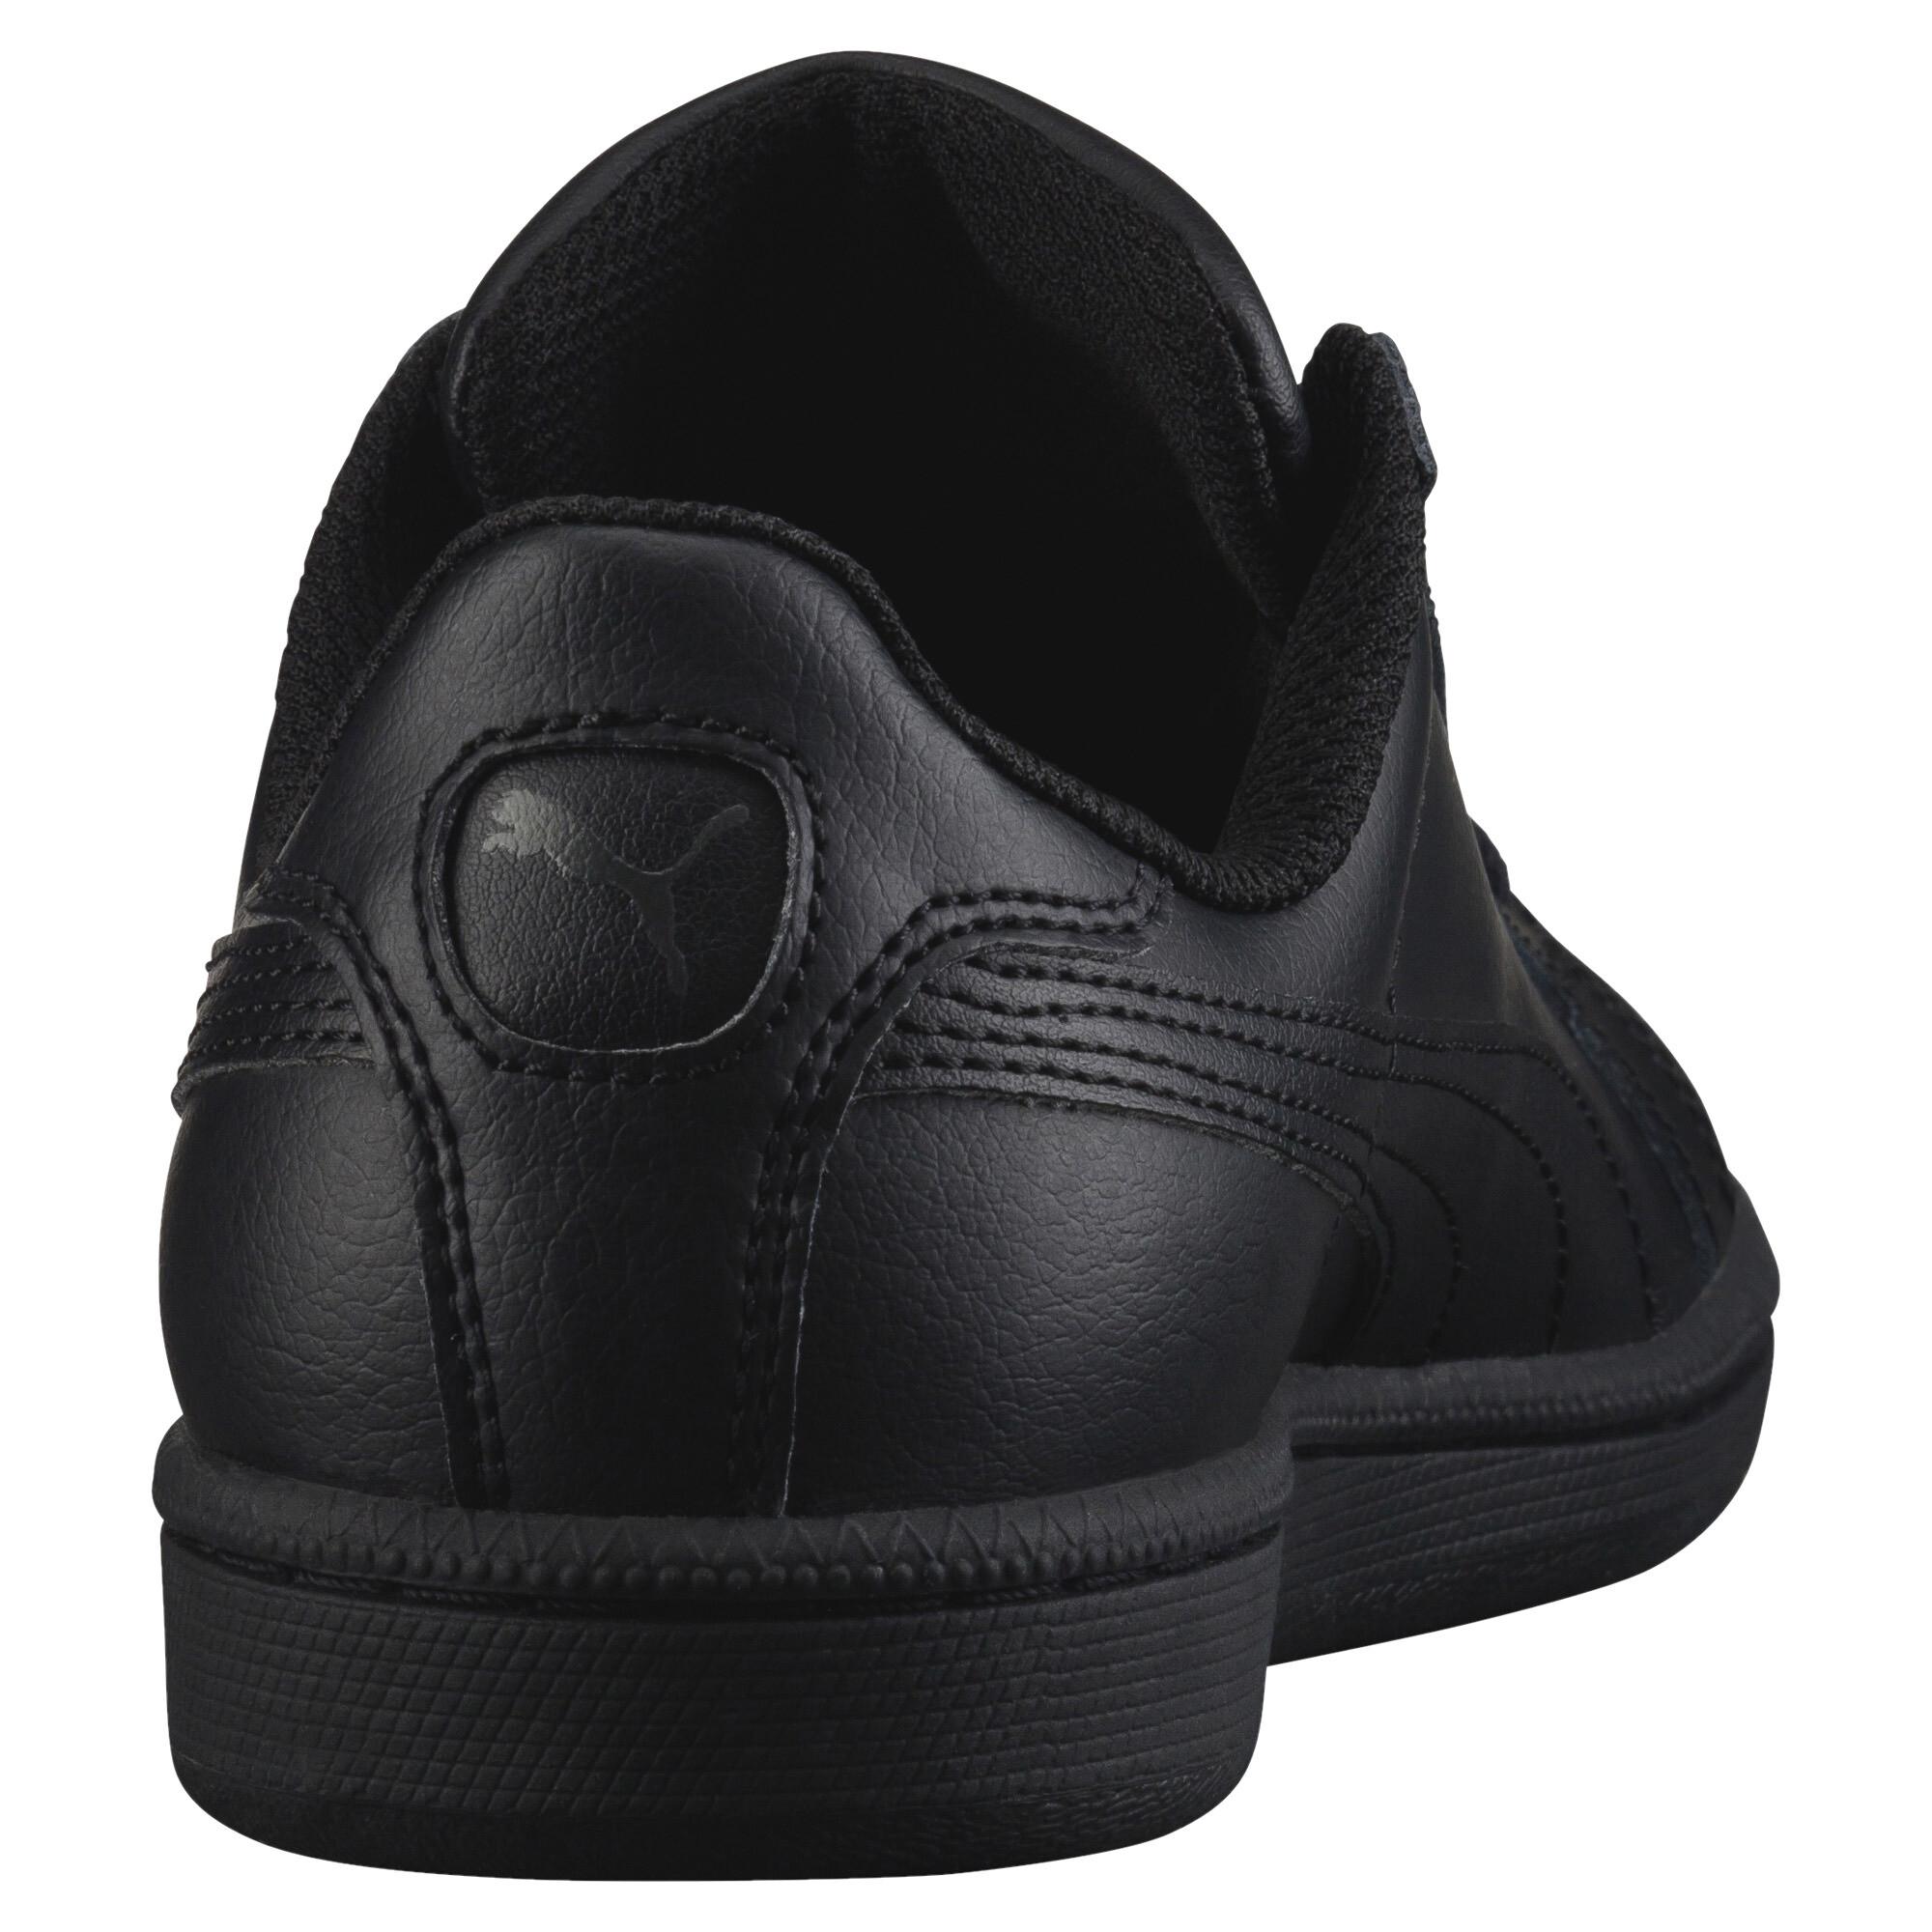 PUMA-Smash-Jr-Sneaker-Unisex-Schuhe-Kinder-Neu Indexbild 3